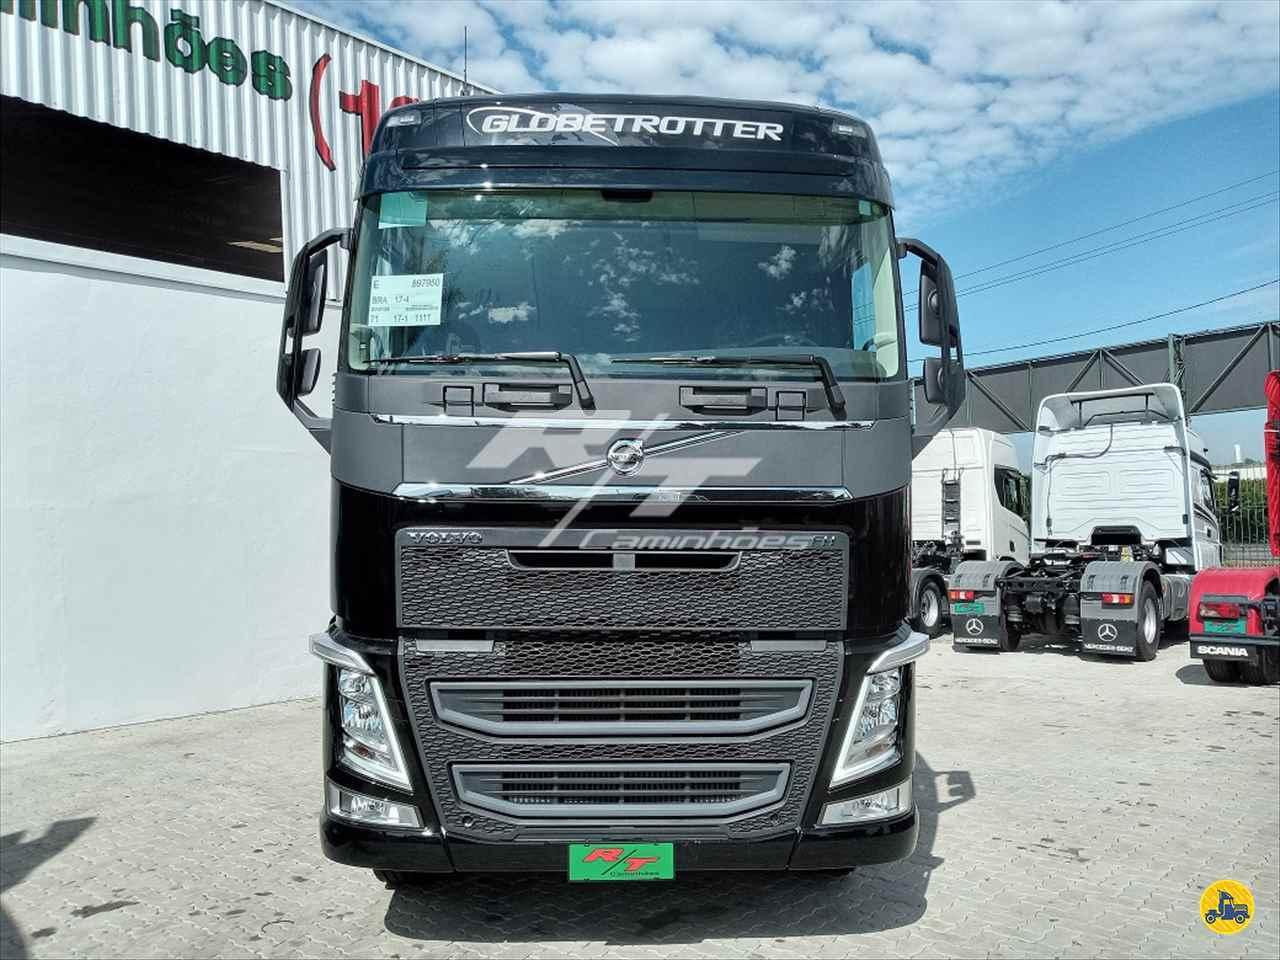 CAMINHAO VOLVO VOLVO FH 500 Cavalo Mecânico Truck 6x2 RT Caminhões SUMARE SÃO PAULO SP